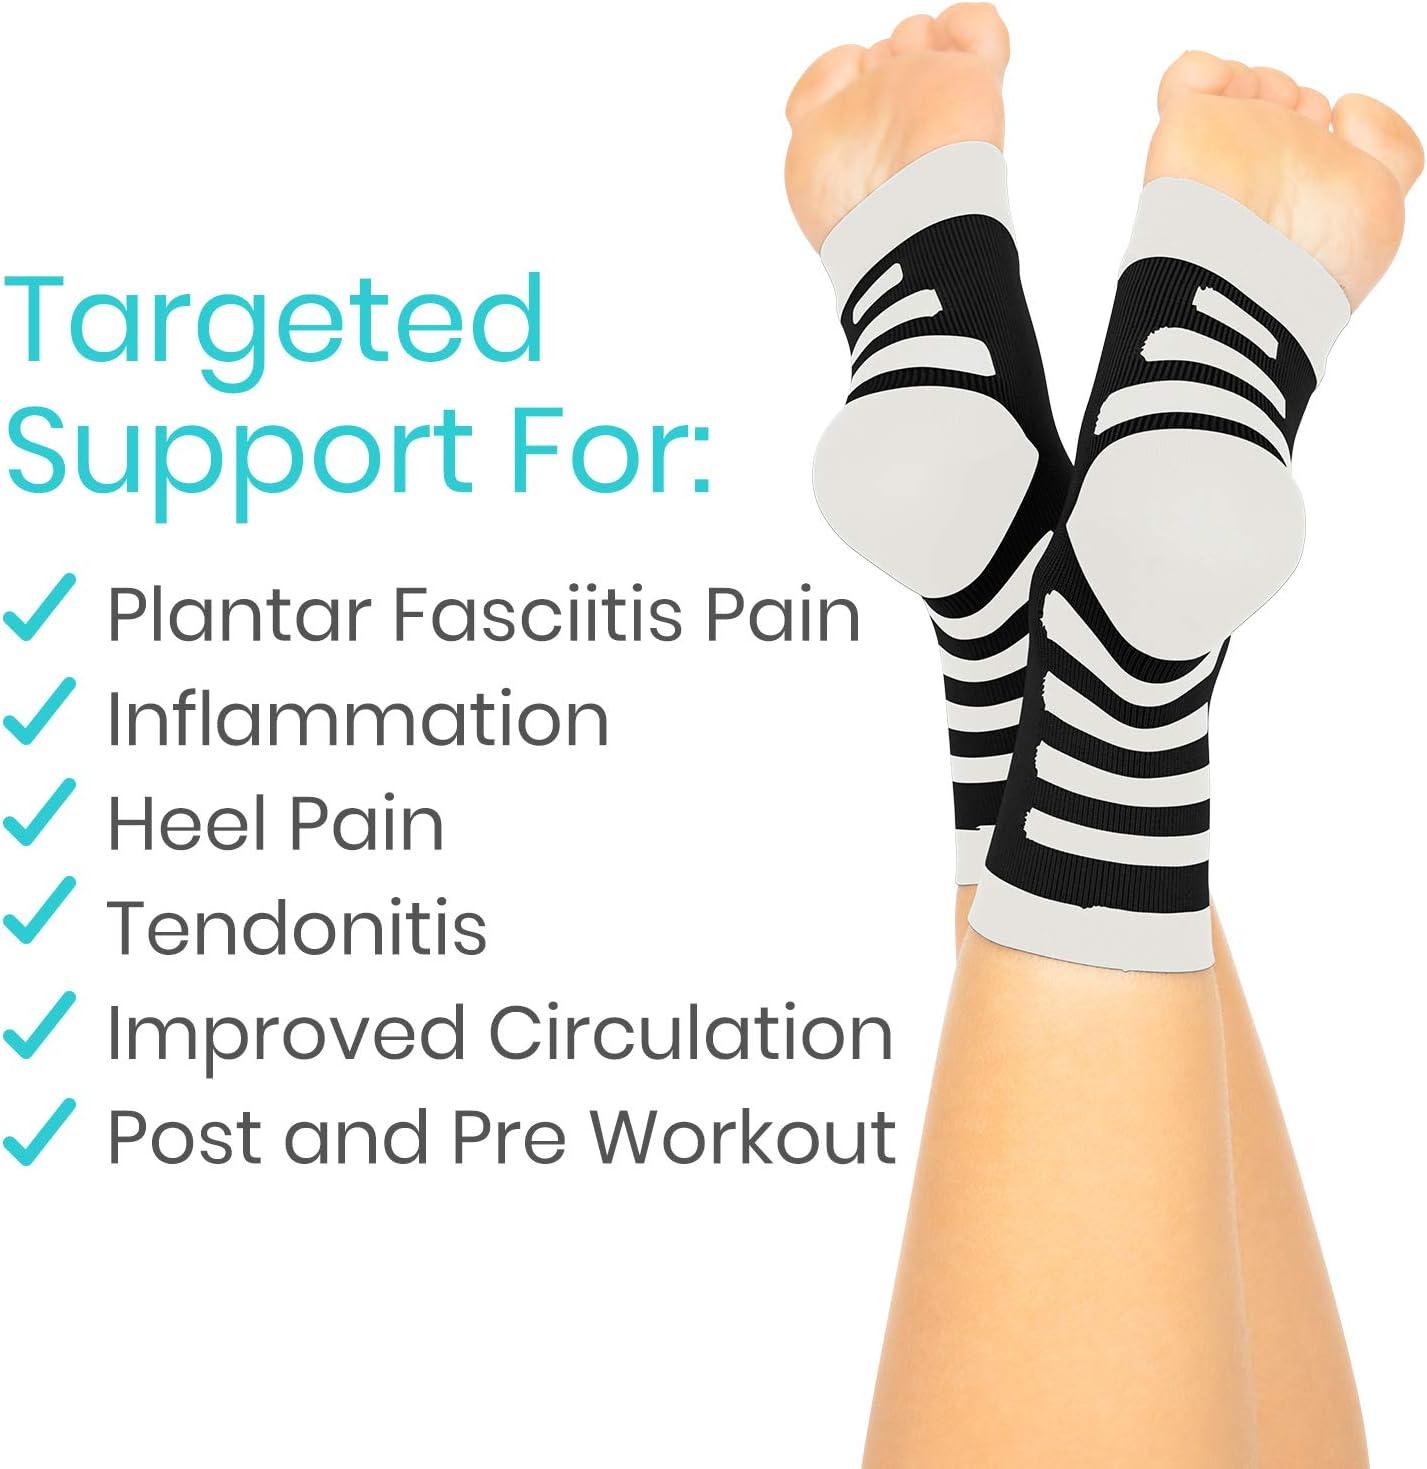 20-30mmHg Ankle Splint Men TruCompress Foot Compression Sleeve Heel Spur Support Toe Wrap Runner Leg Circulation Pain Relief 2 Pairs Women Arthritis Plantar Fasciitis Socks for High Arch